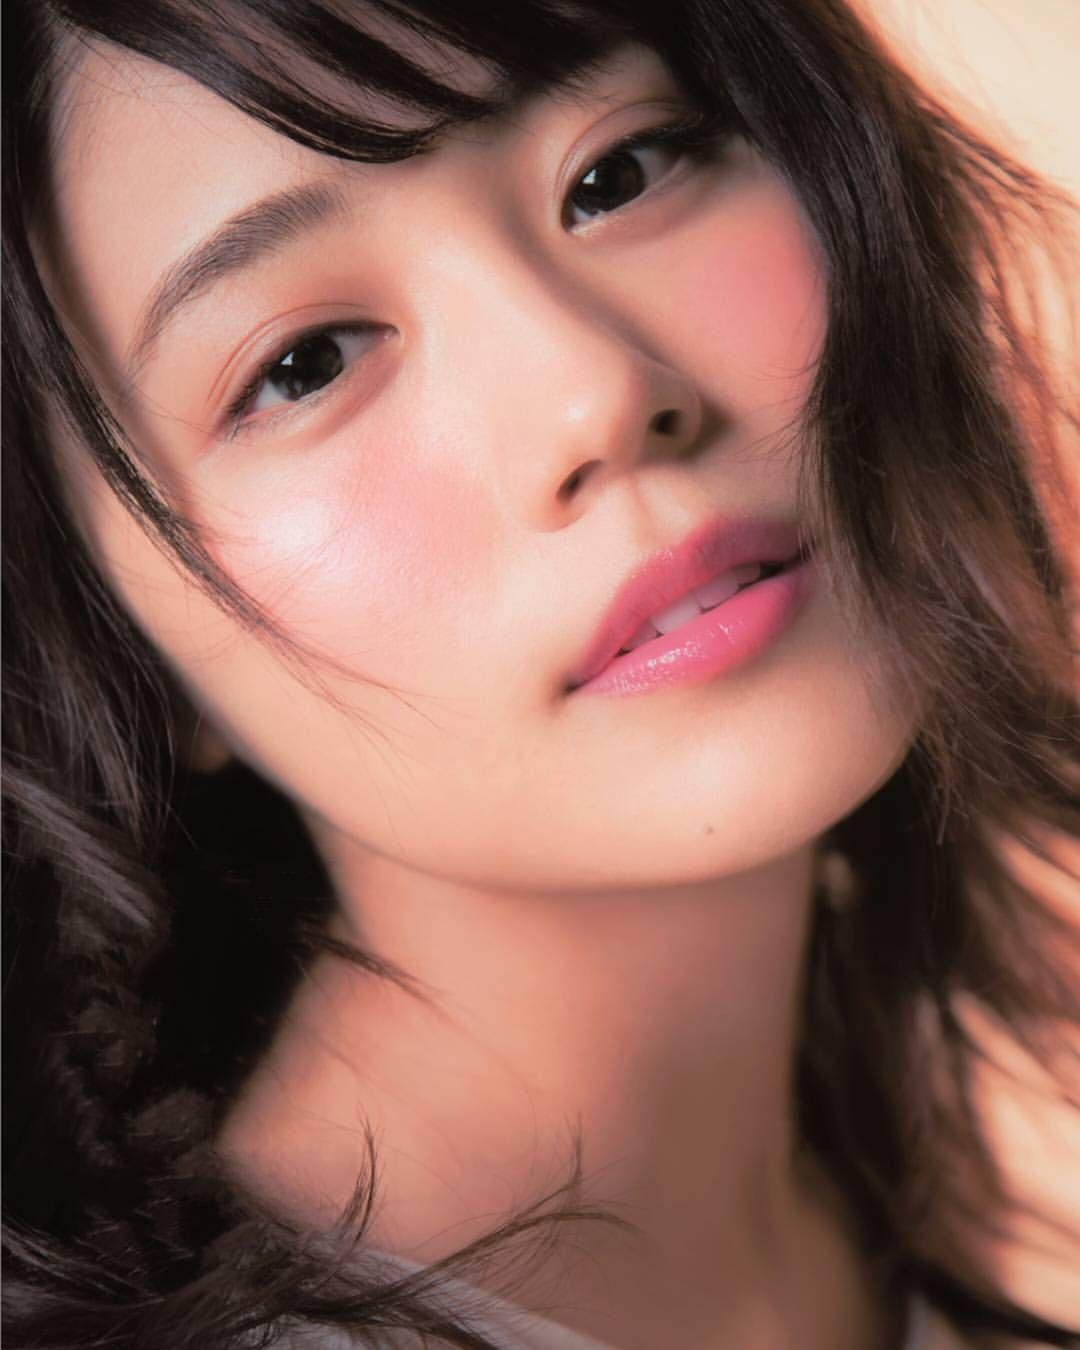 kasumi arimura メイクアップ 有村架純 Kasumi Arimura